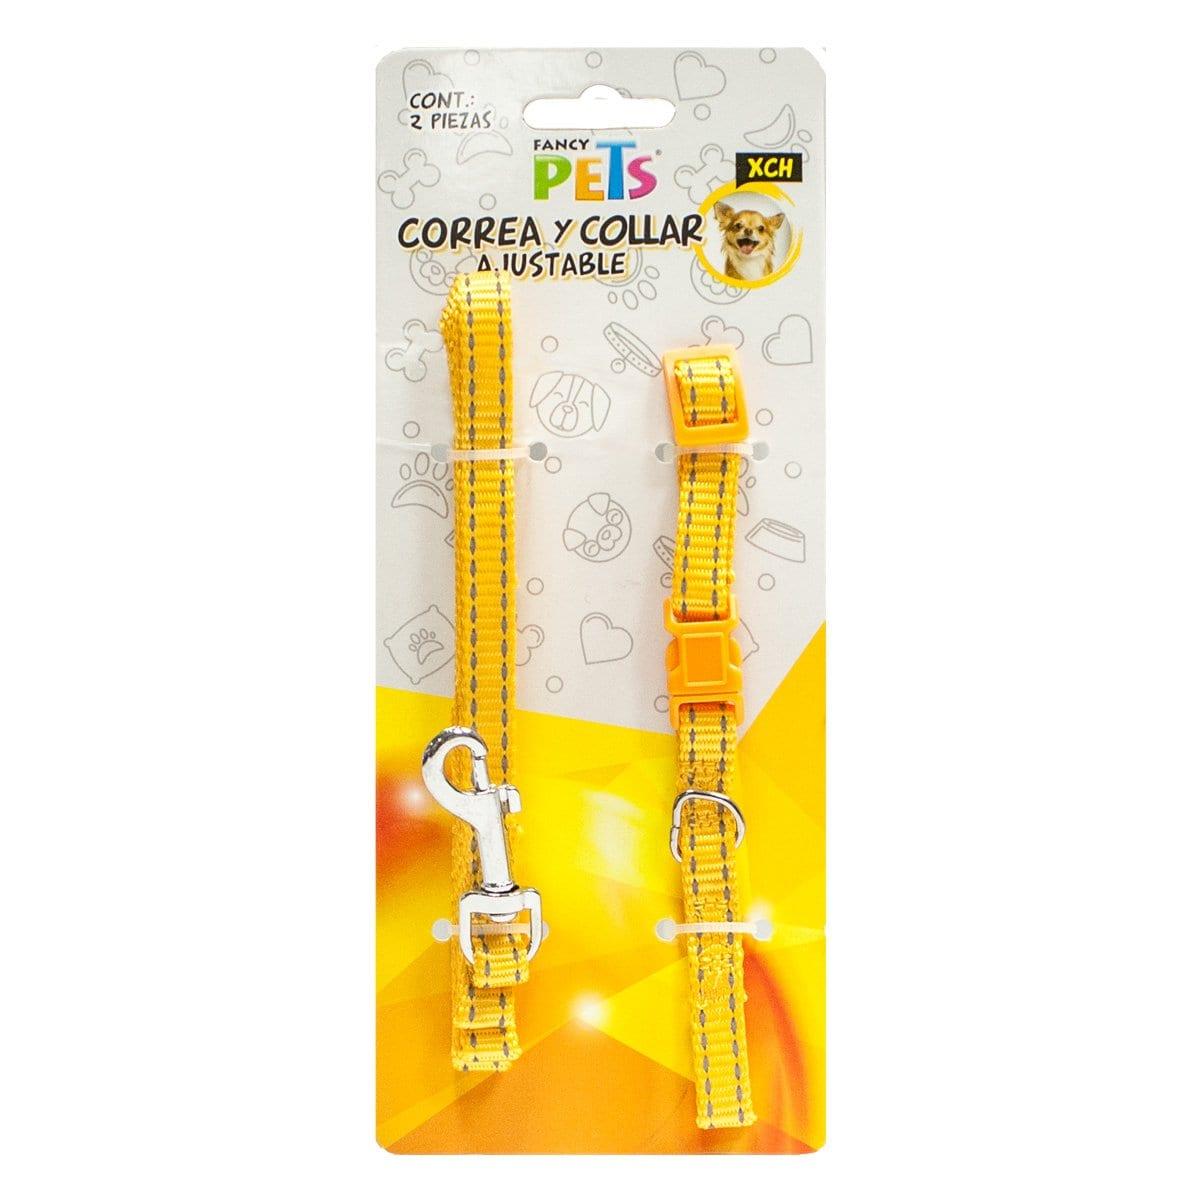 Correa/collar Nylon Bandas Reflejantes Xch Fancy Pets Mod. Fl8709